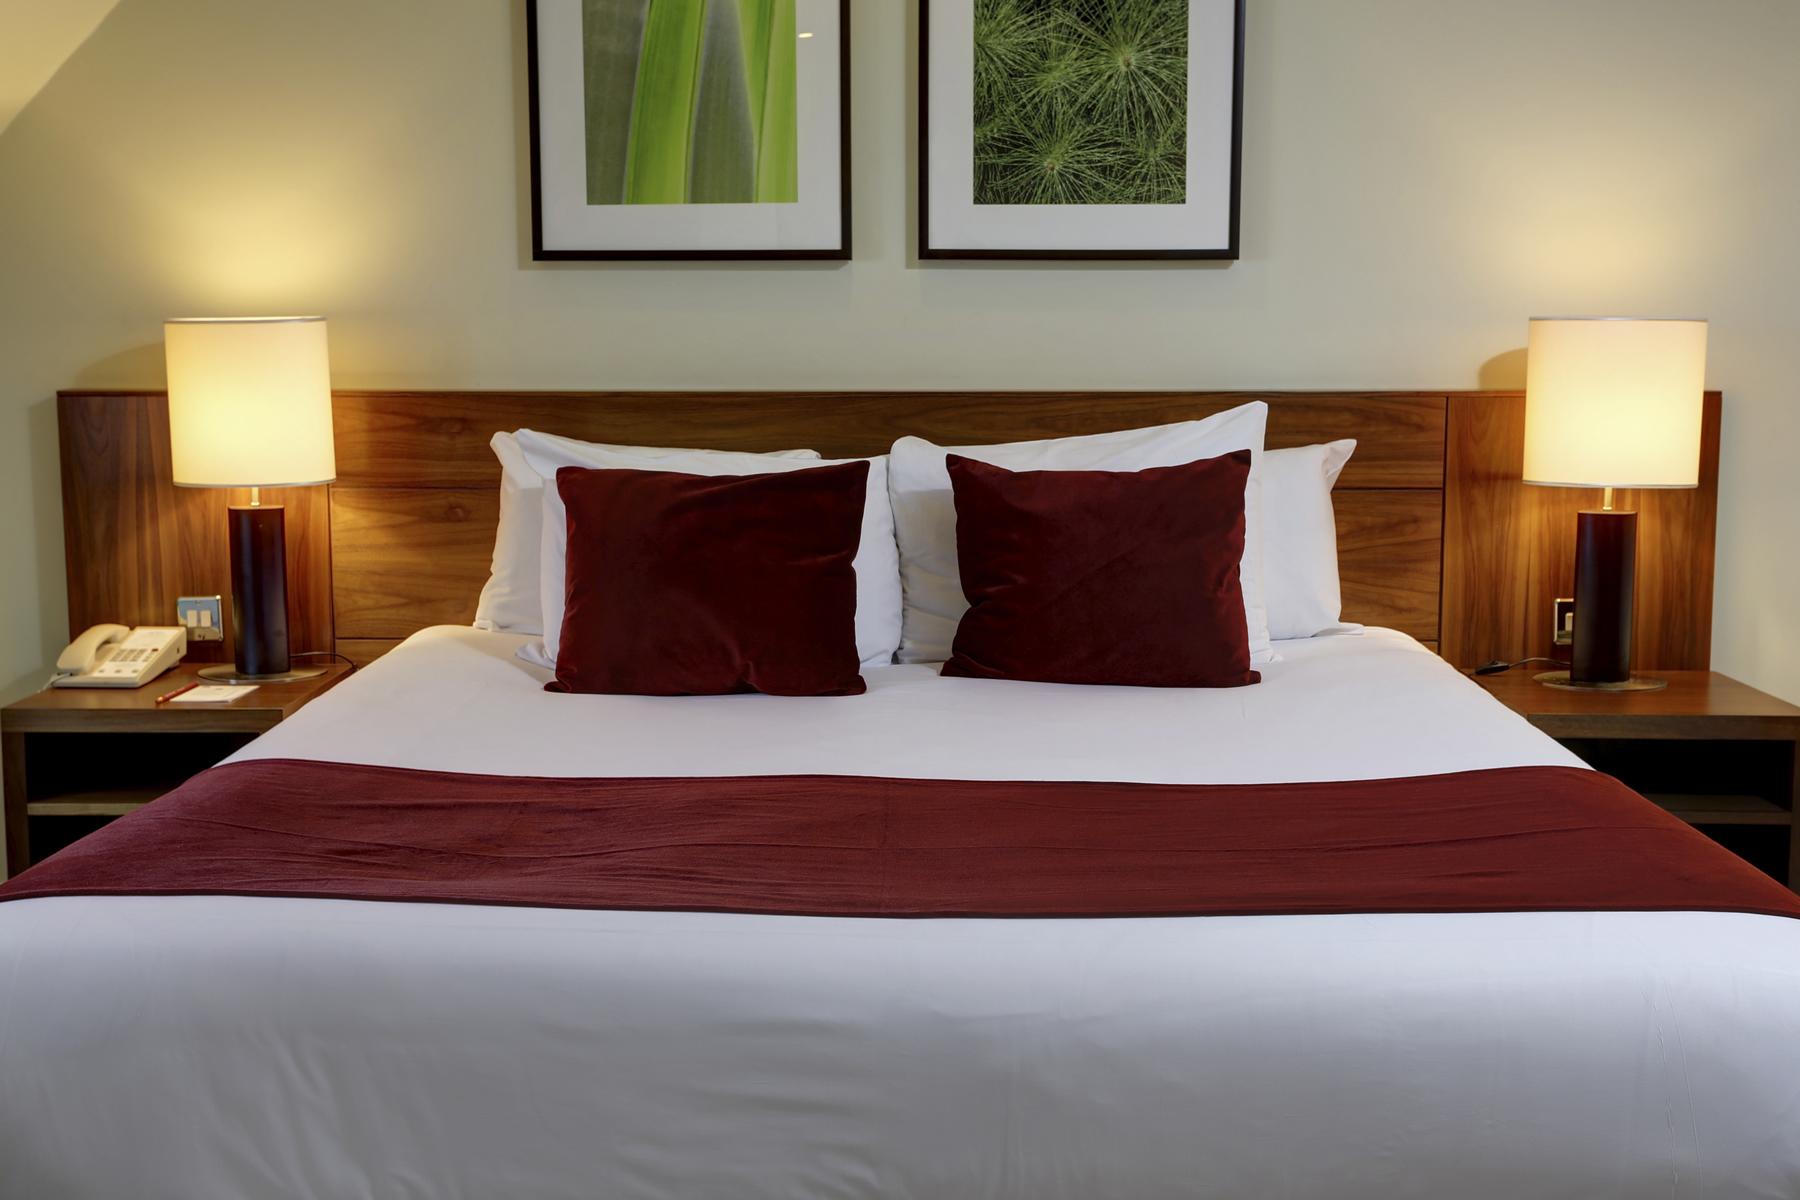 Club Double Bedroom at Best Western Ship Hotel Weybridge Surrey